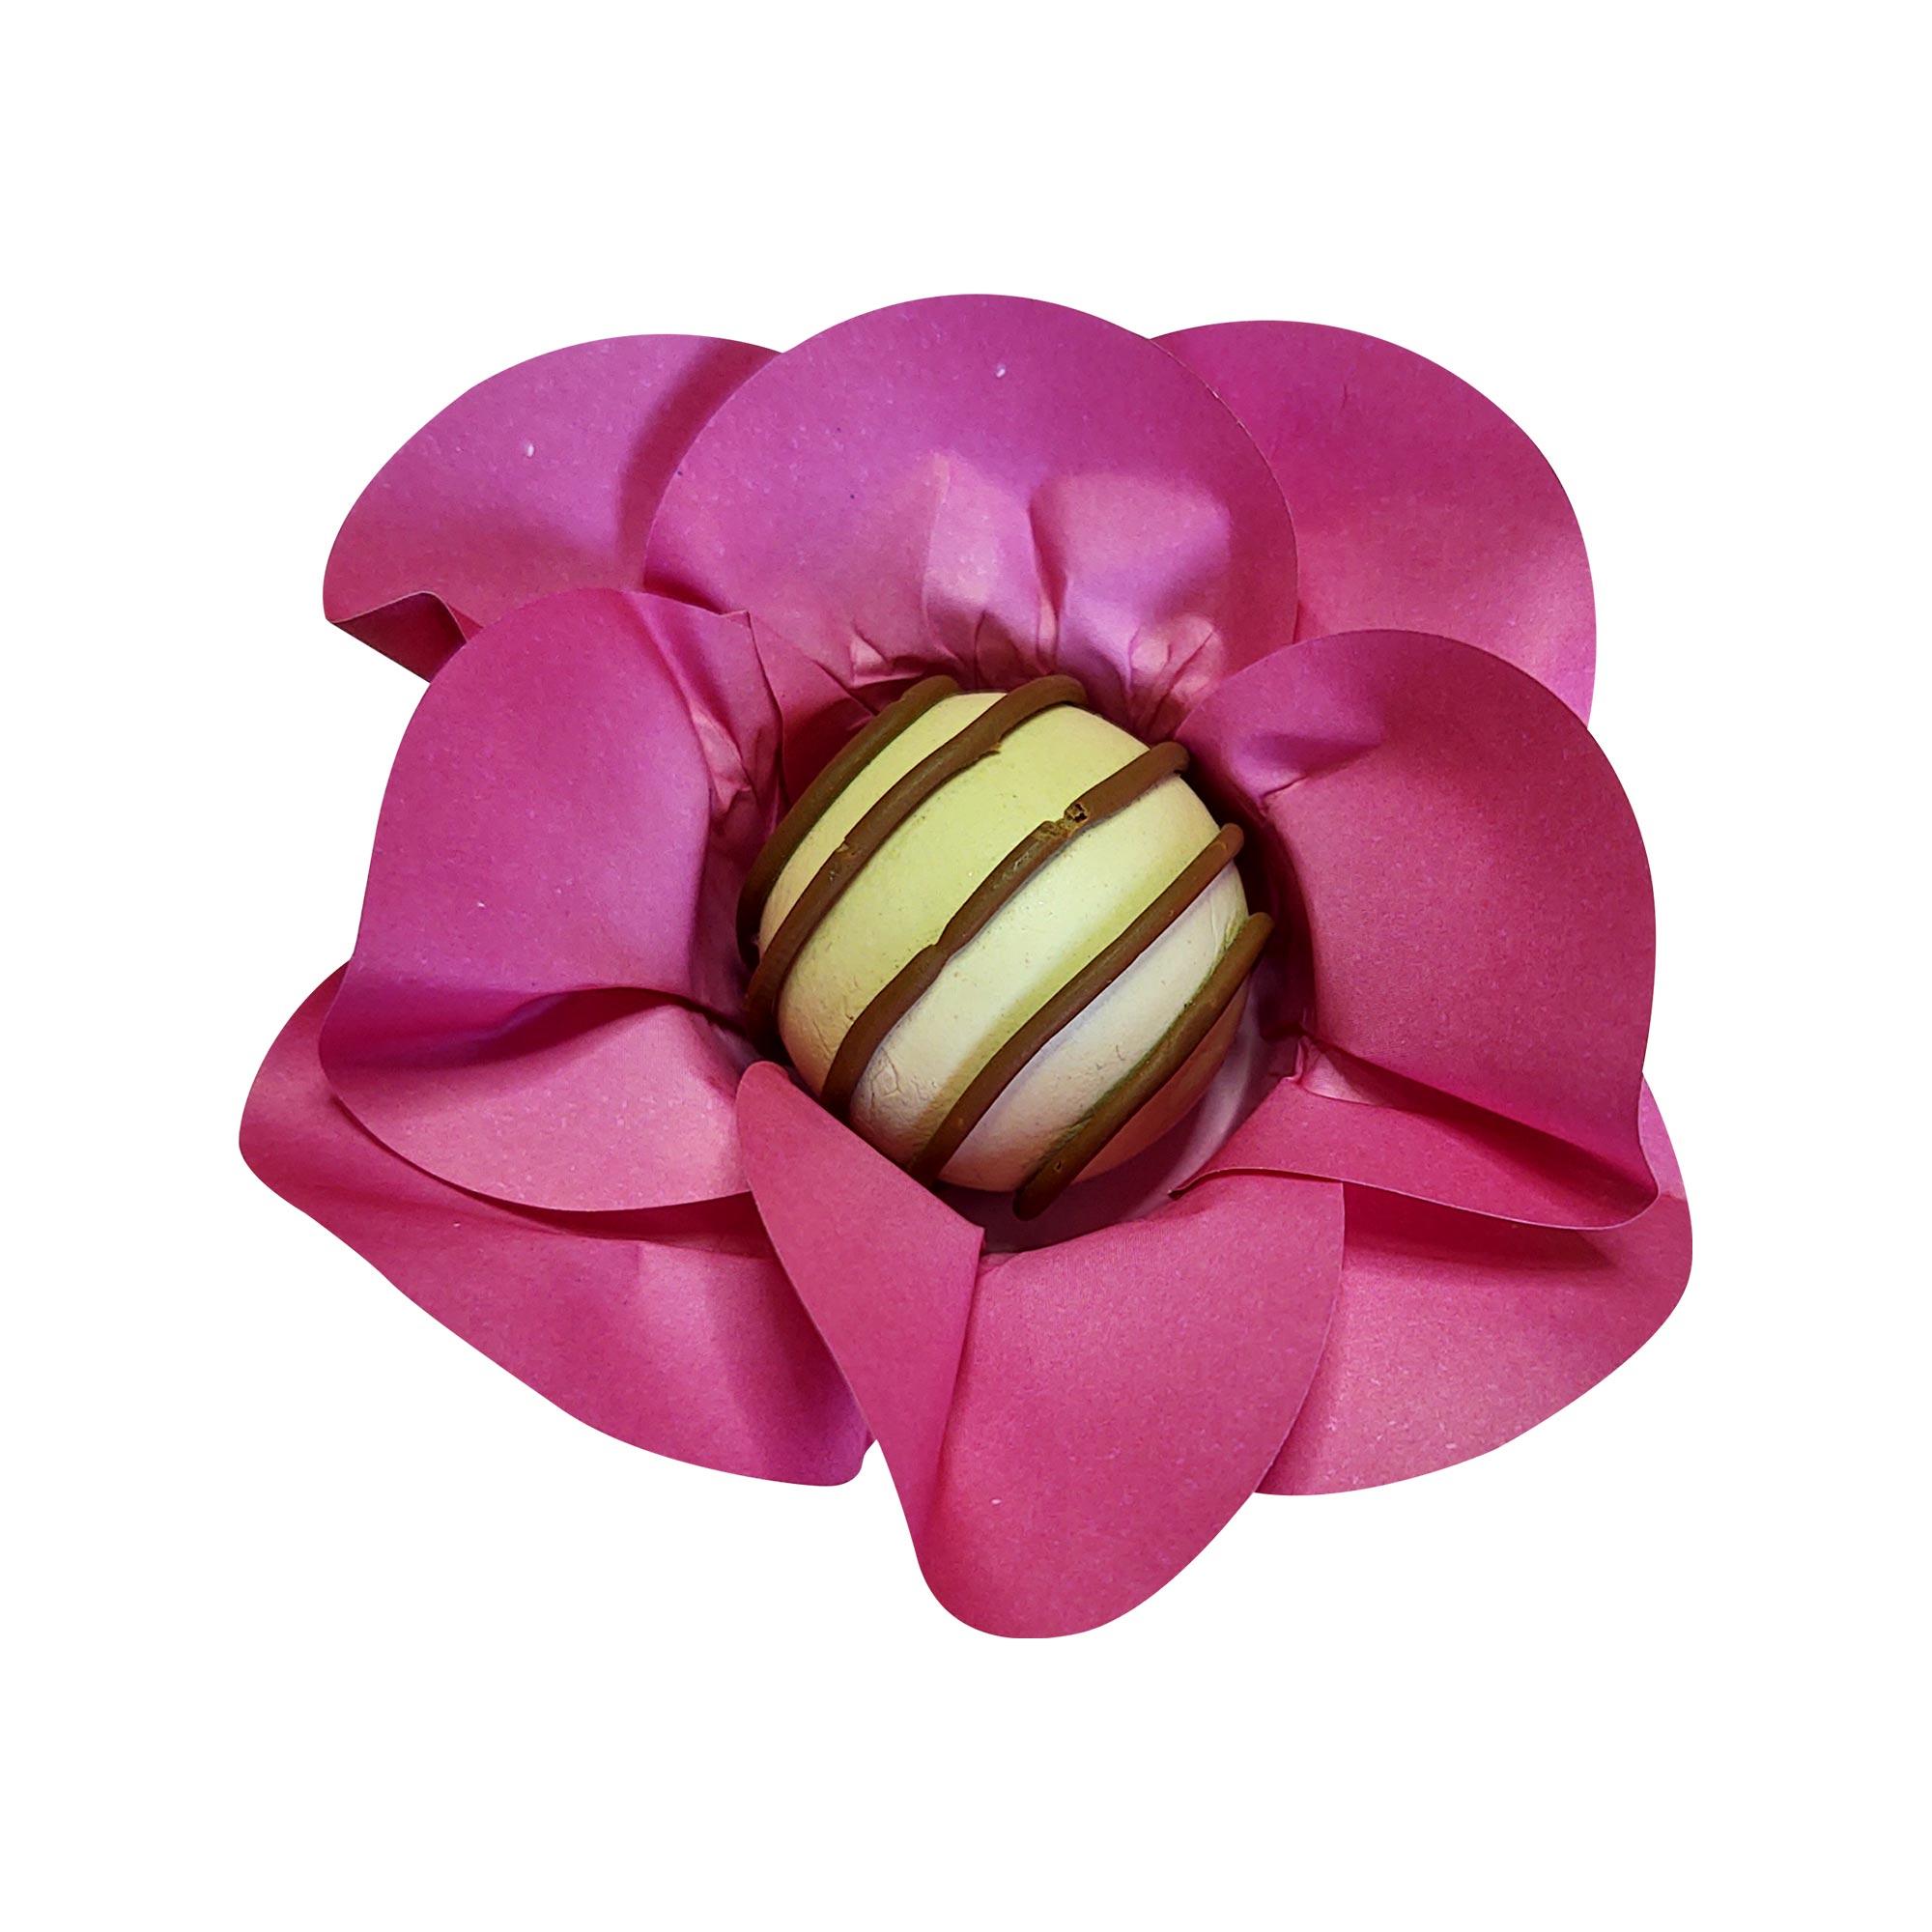 Forminha para Doces Mini Margarida em Papel Especial Pink Kit 40 Unidades